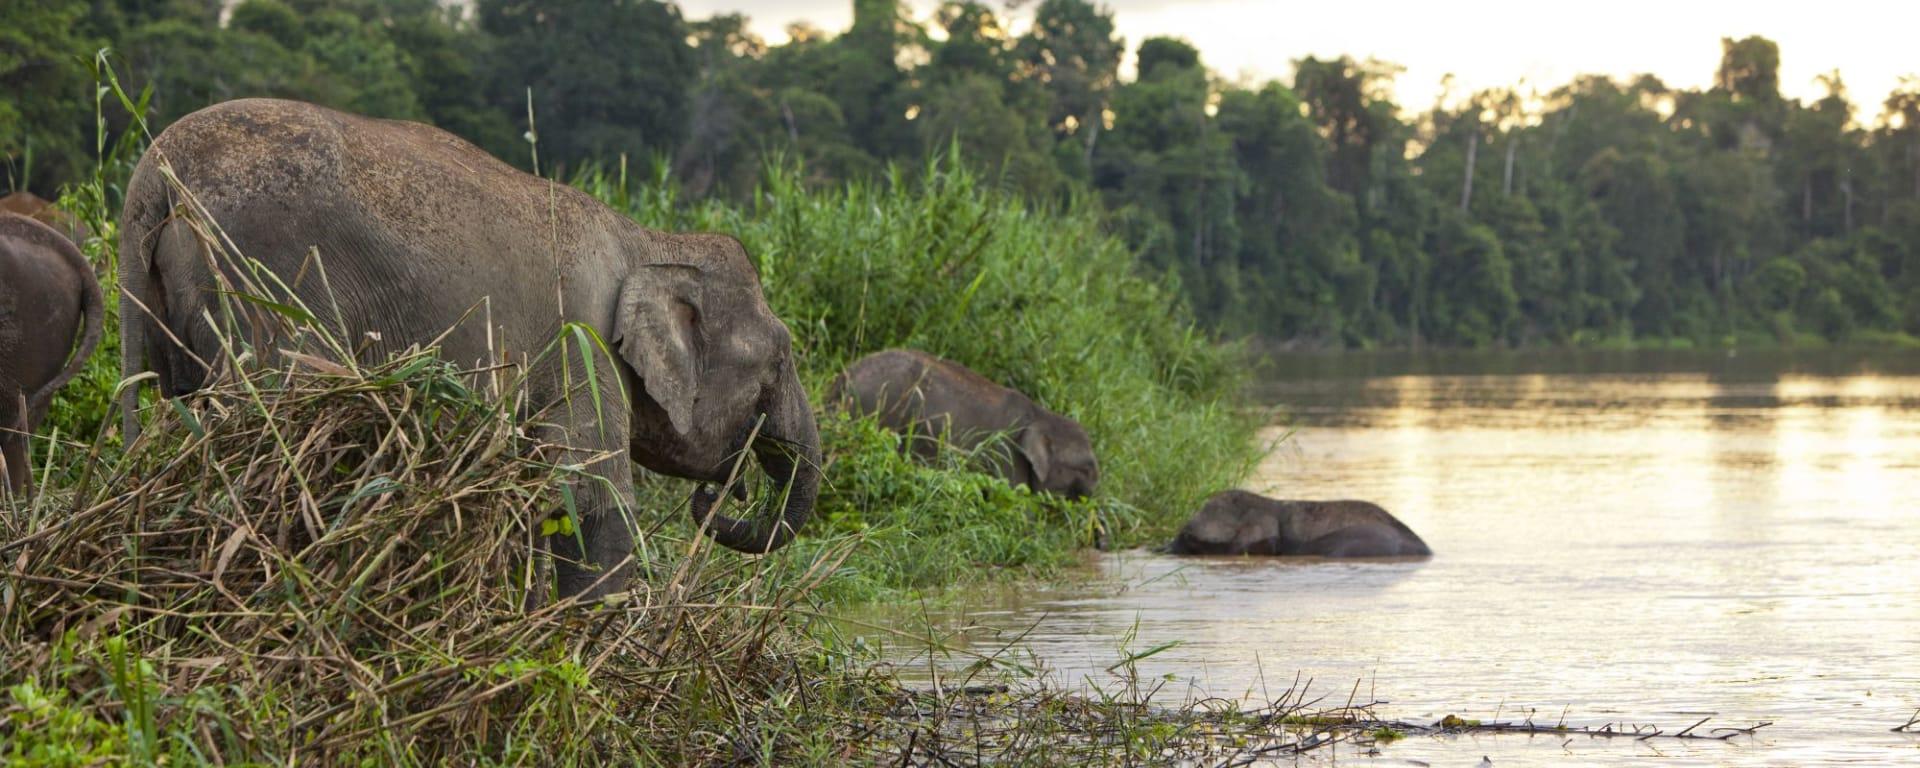 Vie sauvage de Bornéo / Borneo Rainforest Lodge de Kota Kinabalu: Kinabatangang River